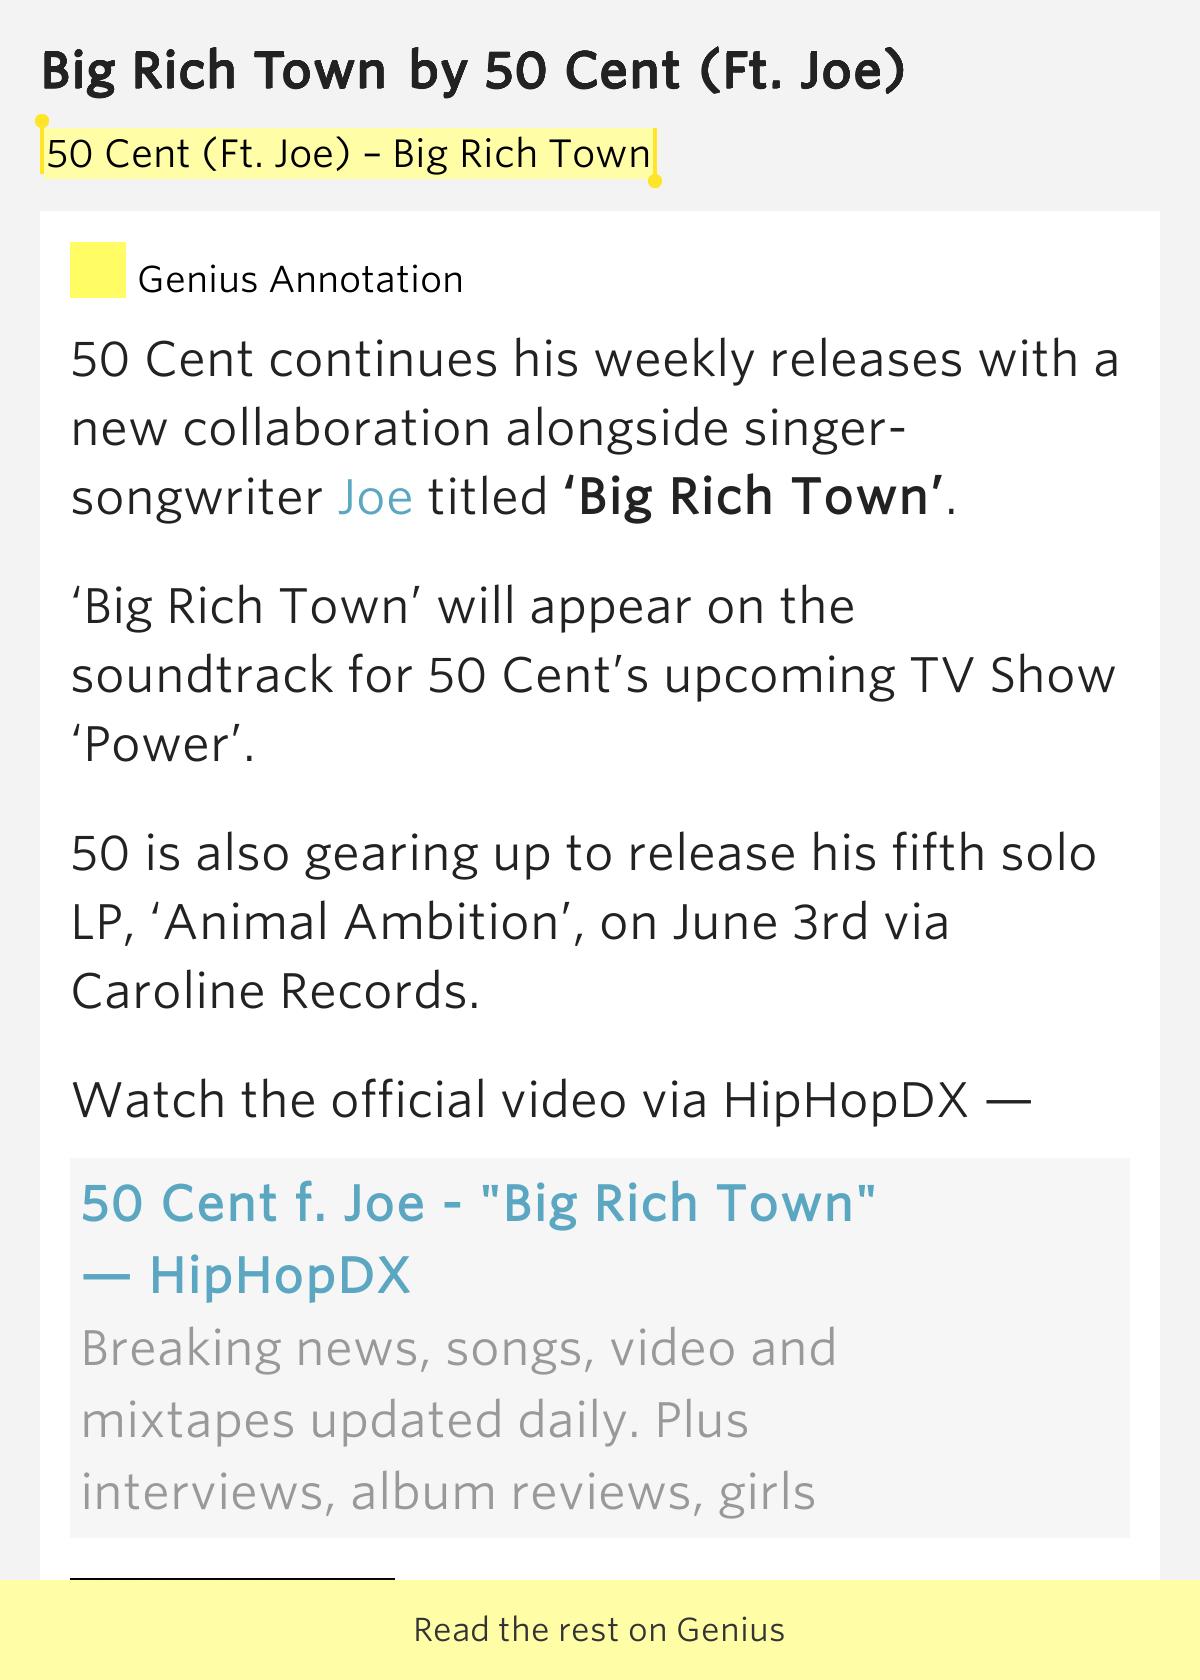 50 Cent - BIG RICH TOWN - Lyrics - YouTube